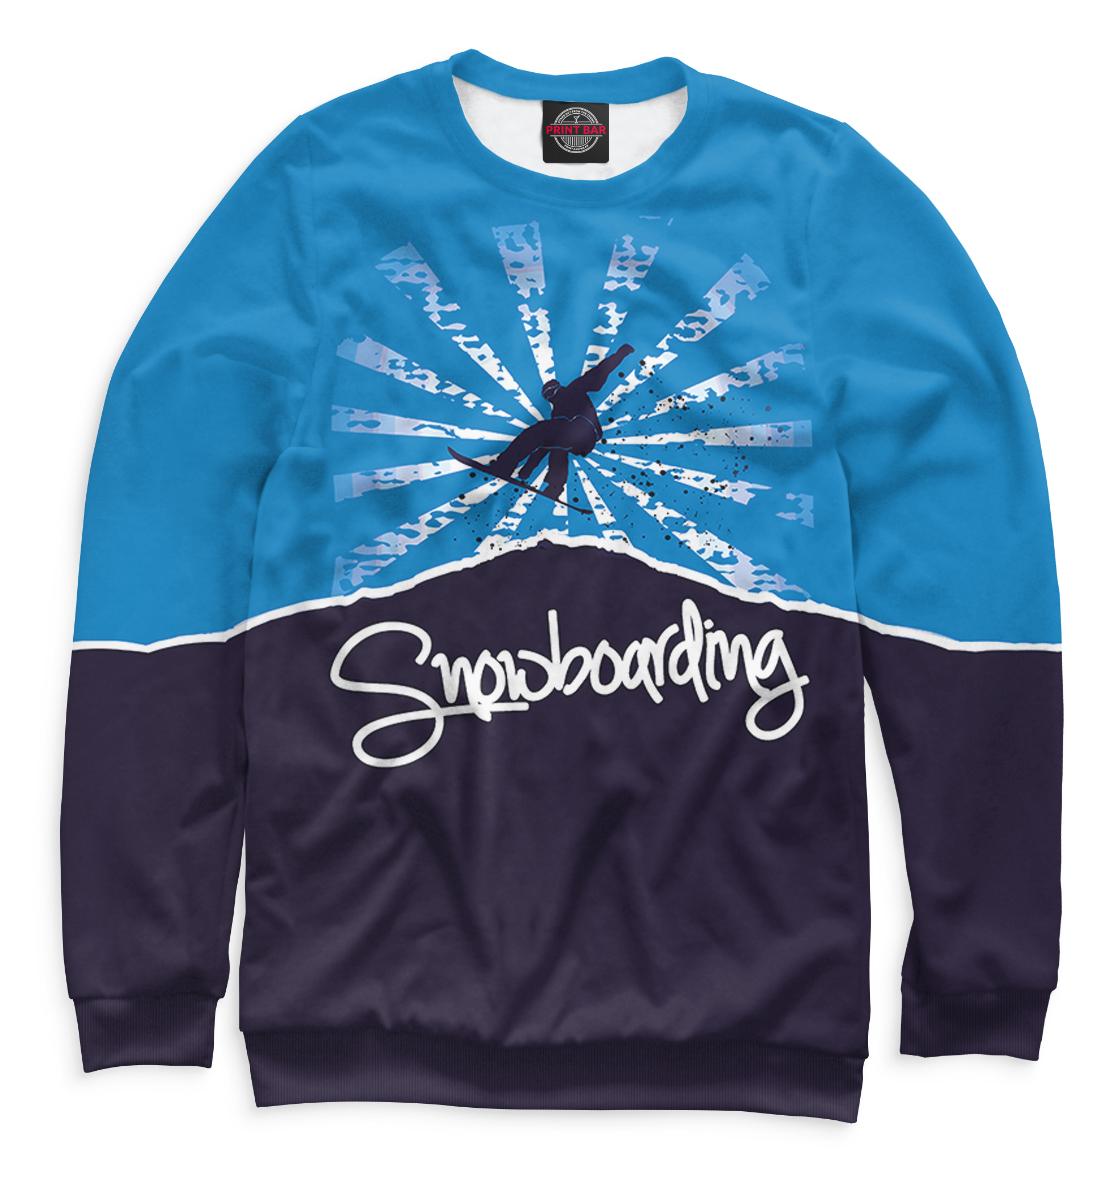 Купить Сноубординг, Printbar, Свитшоты, SNW-449648-swi-1